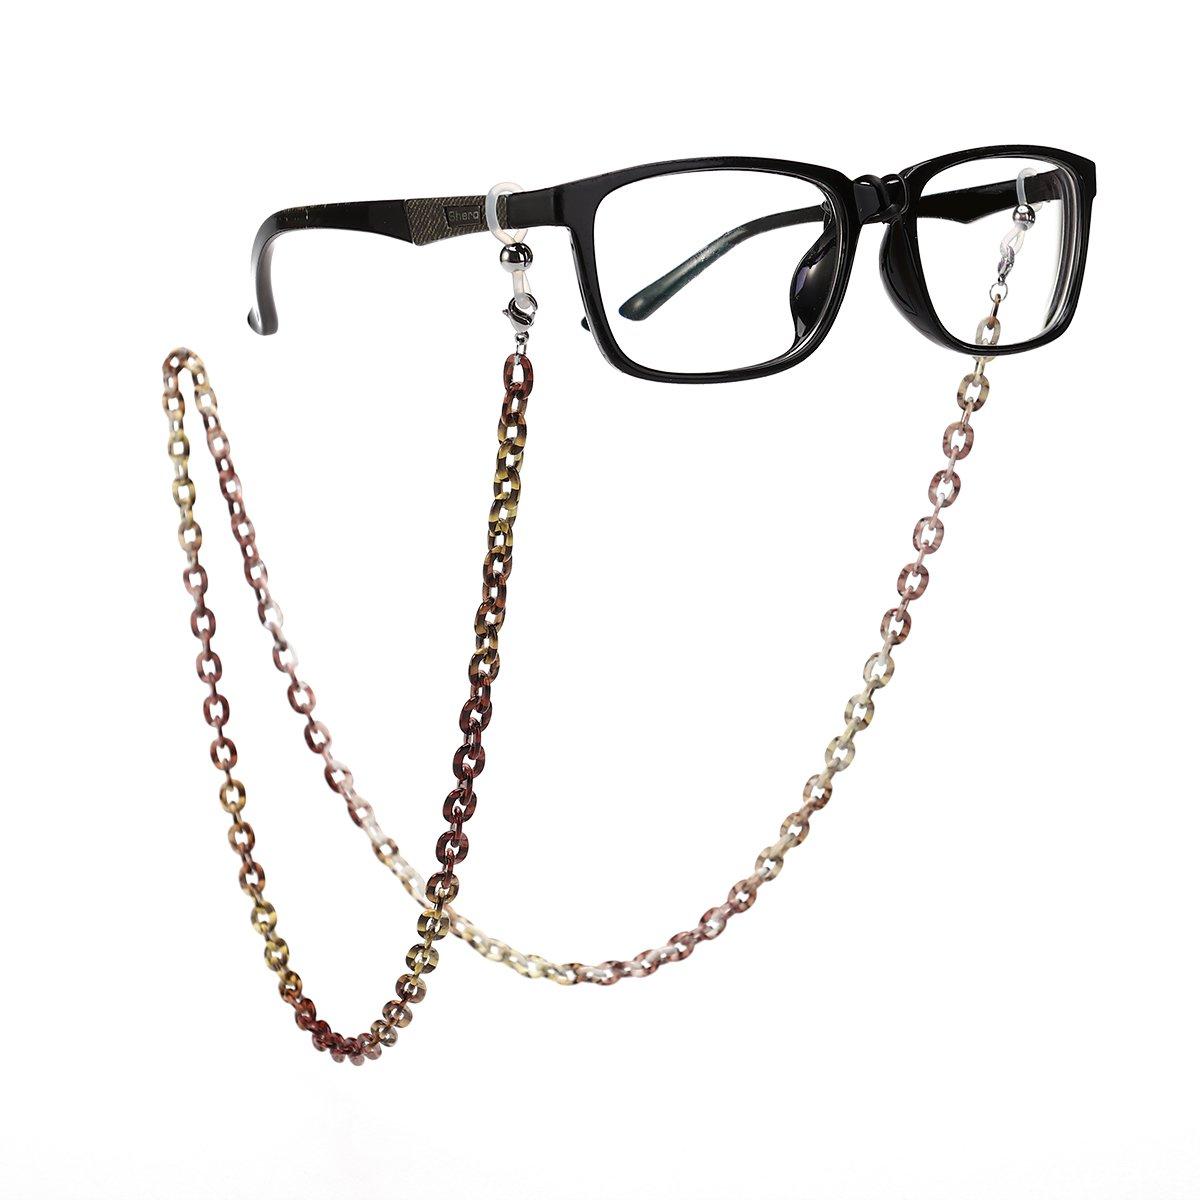 Tinksky Brillenkette Brillenhalter Aluminium Brillenband Sonnenbrillen Gläser Halterung FET05L6J21L43Z5PIUWJ